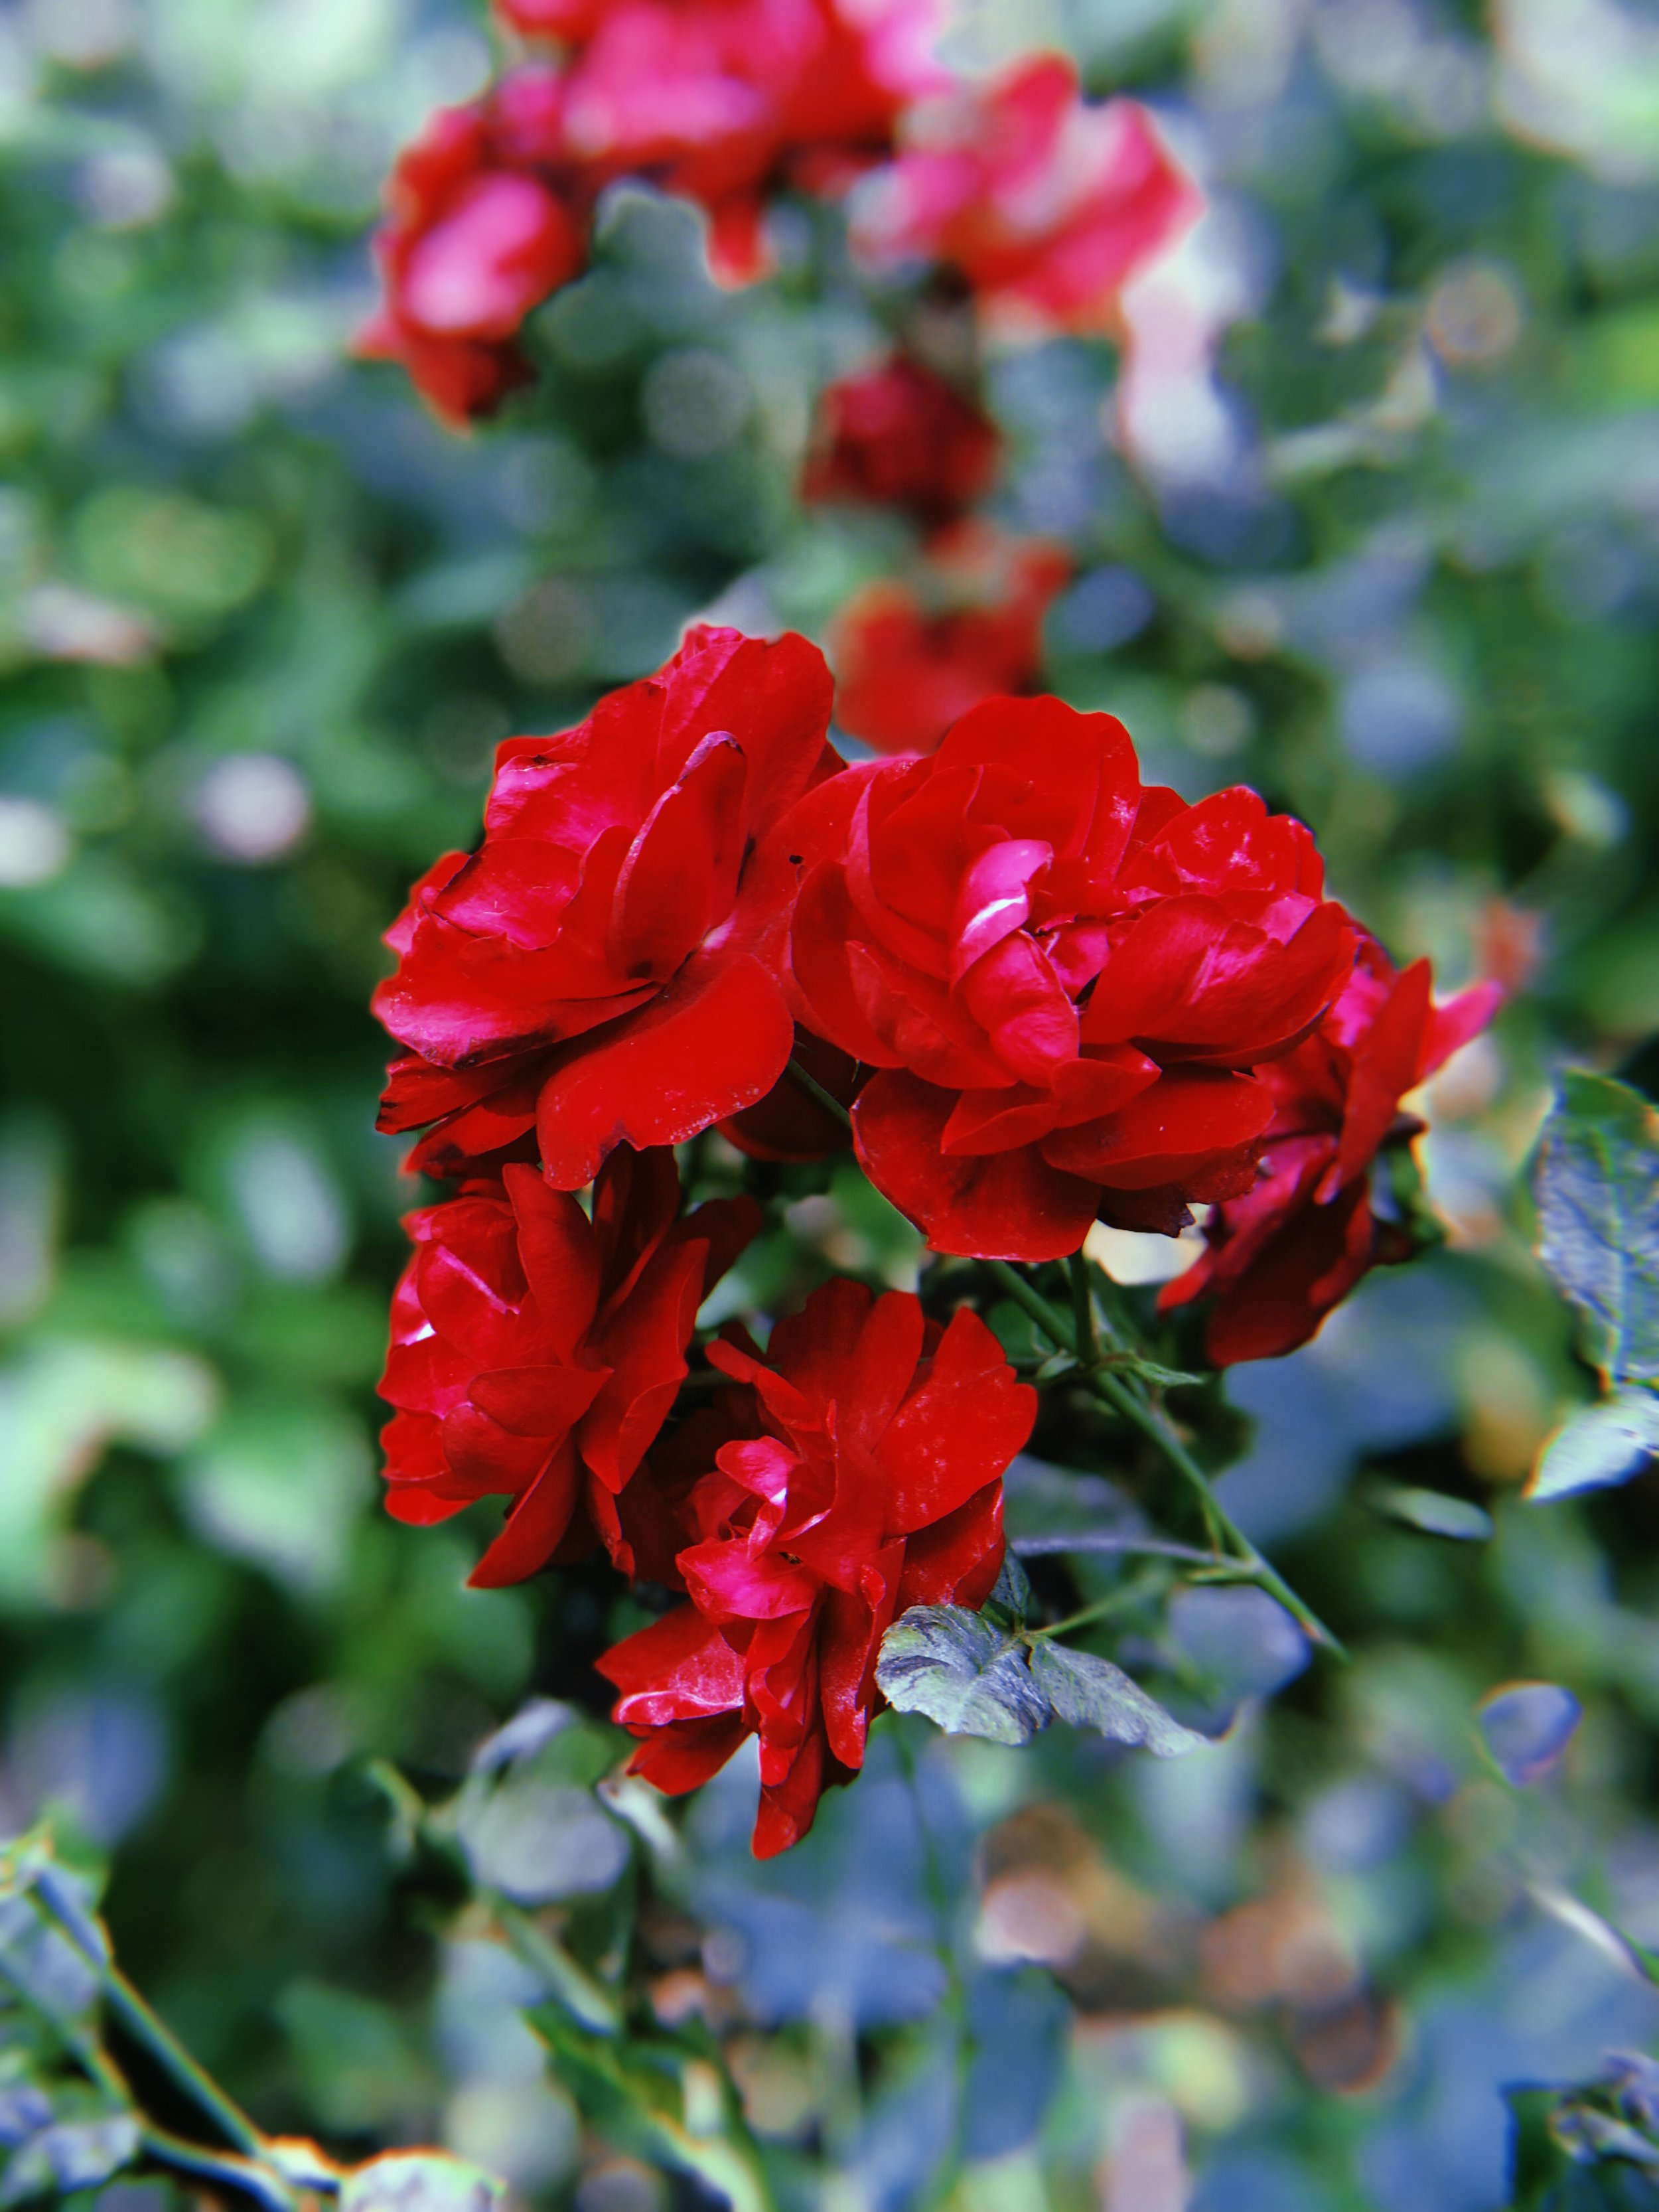 A Flower from Freud's Garden